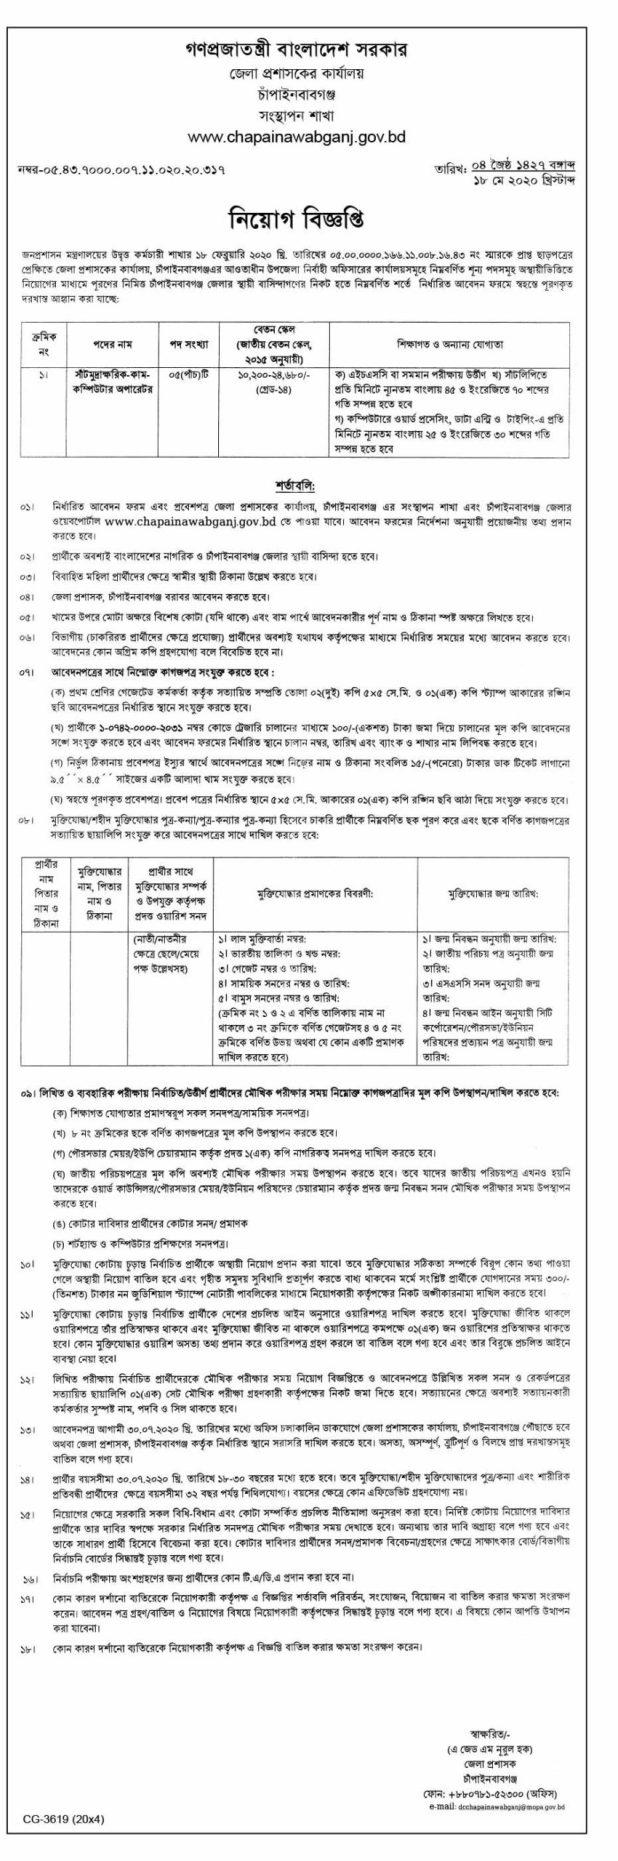 Chapainawabganj DC Office Job Circular 2020